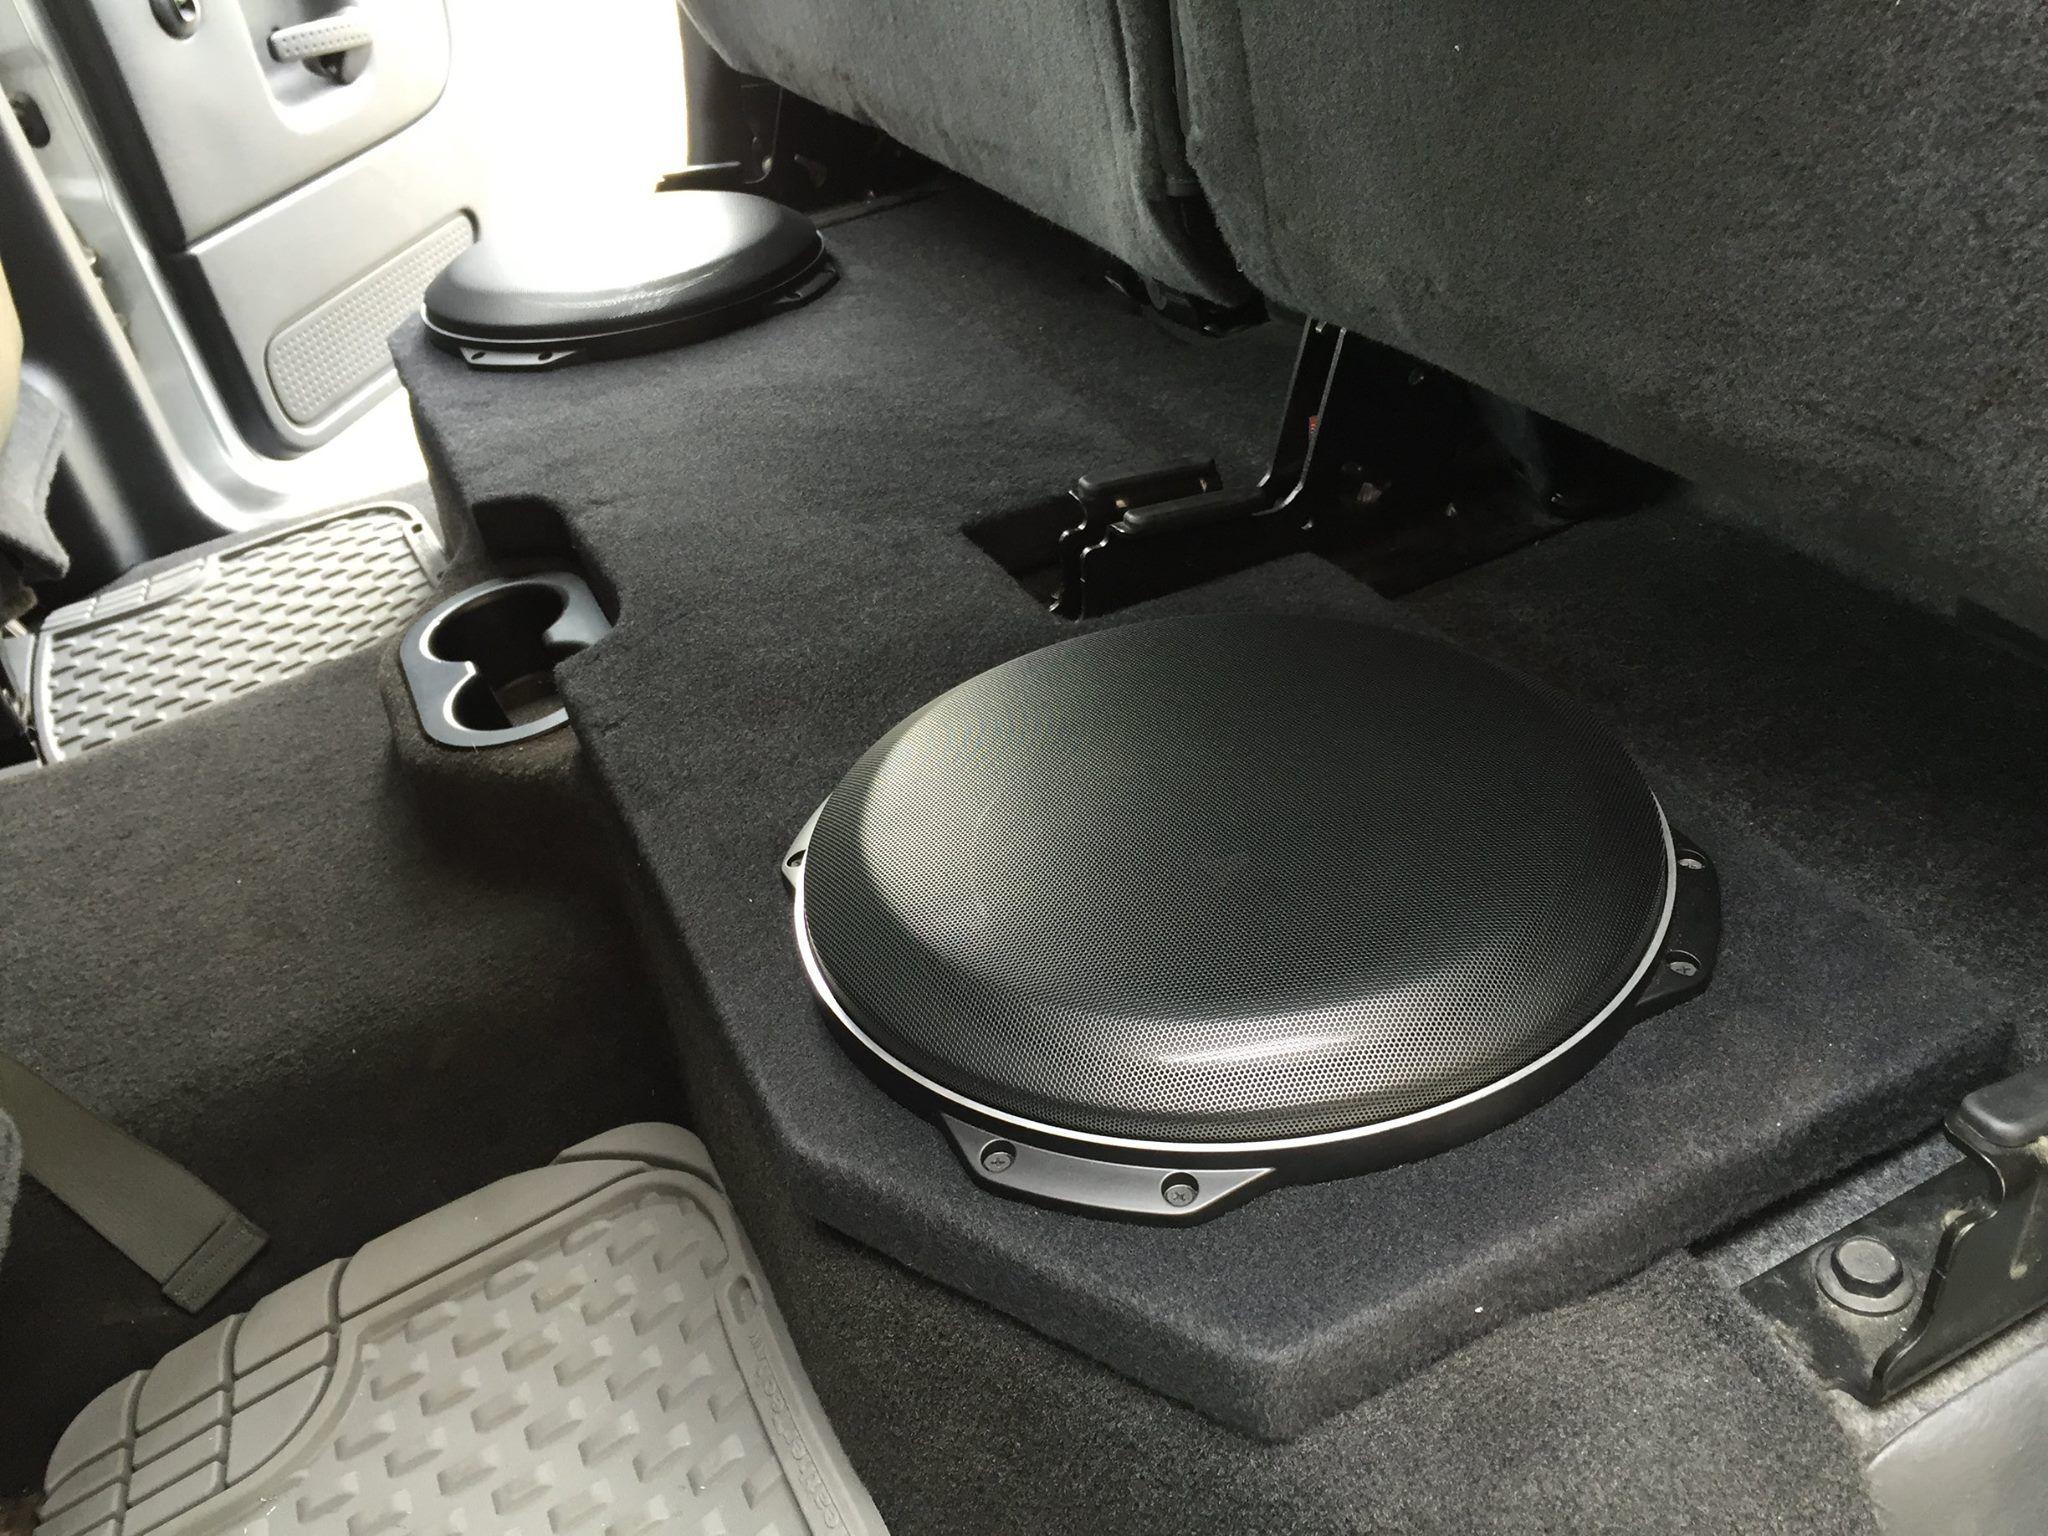 Our Skilled Fabrication Team Built This Custom Fiberglass Under Seat